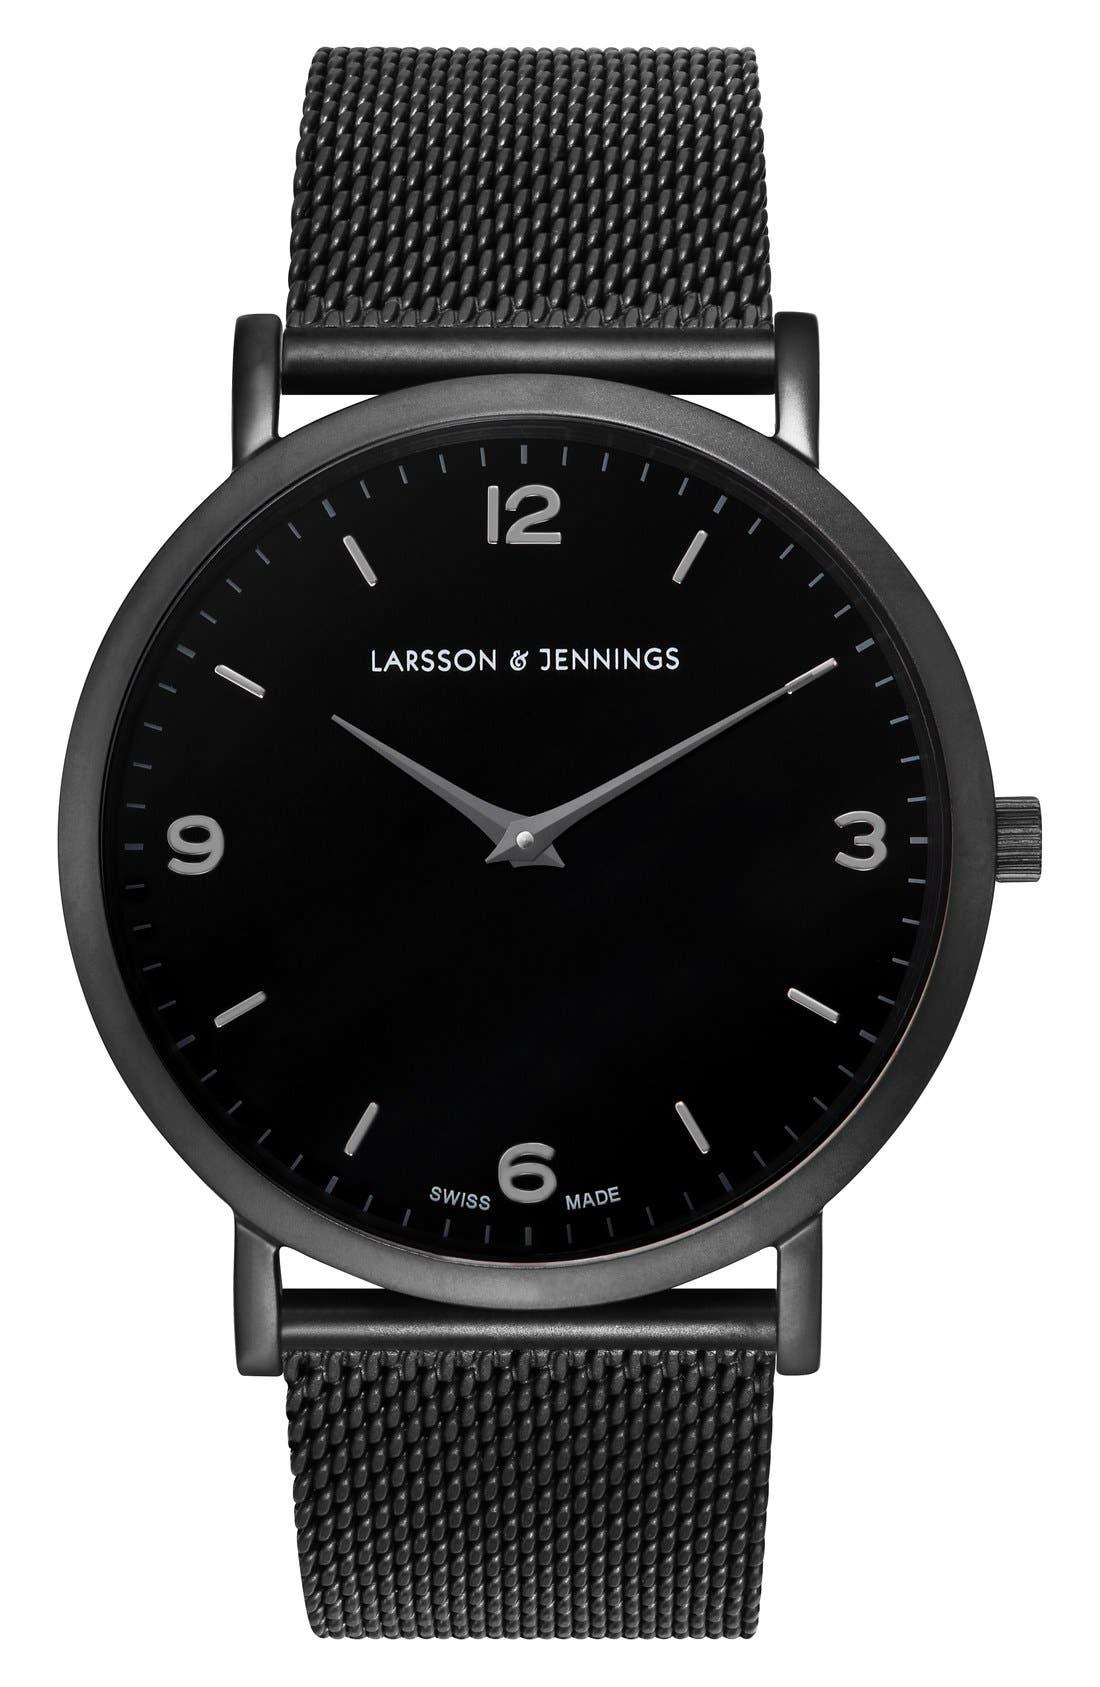 LARSSON & JENNINGS Lugano Mesh Strap Watch, 38mm, Main, color, 001